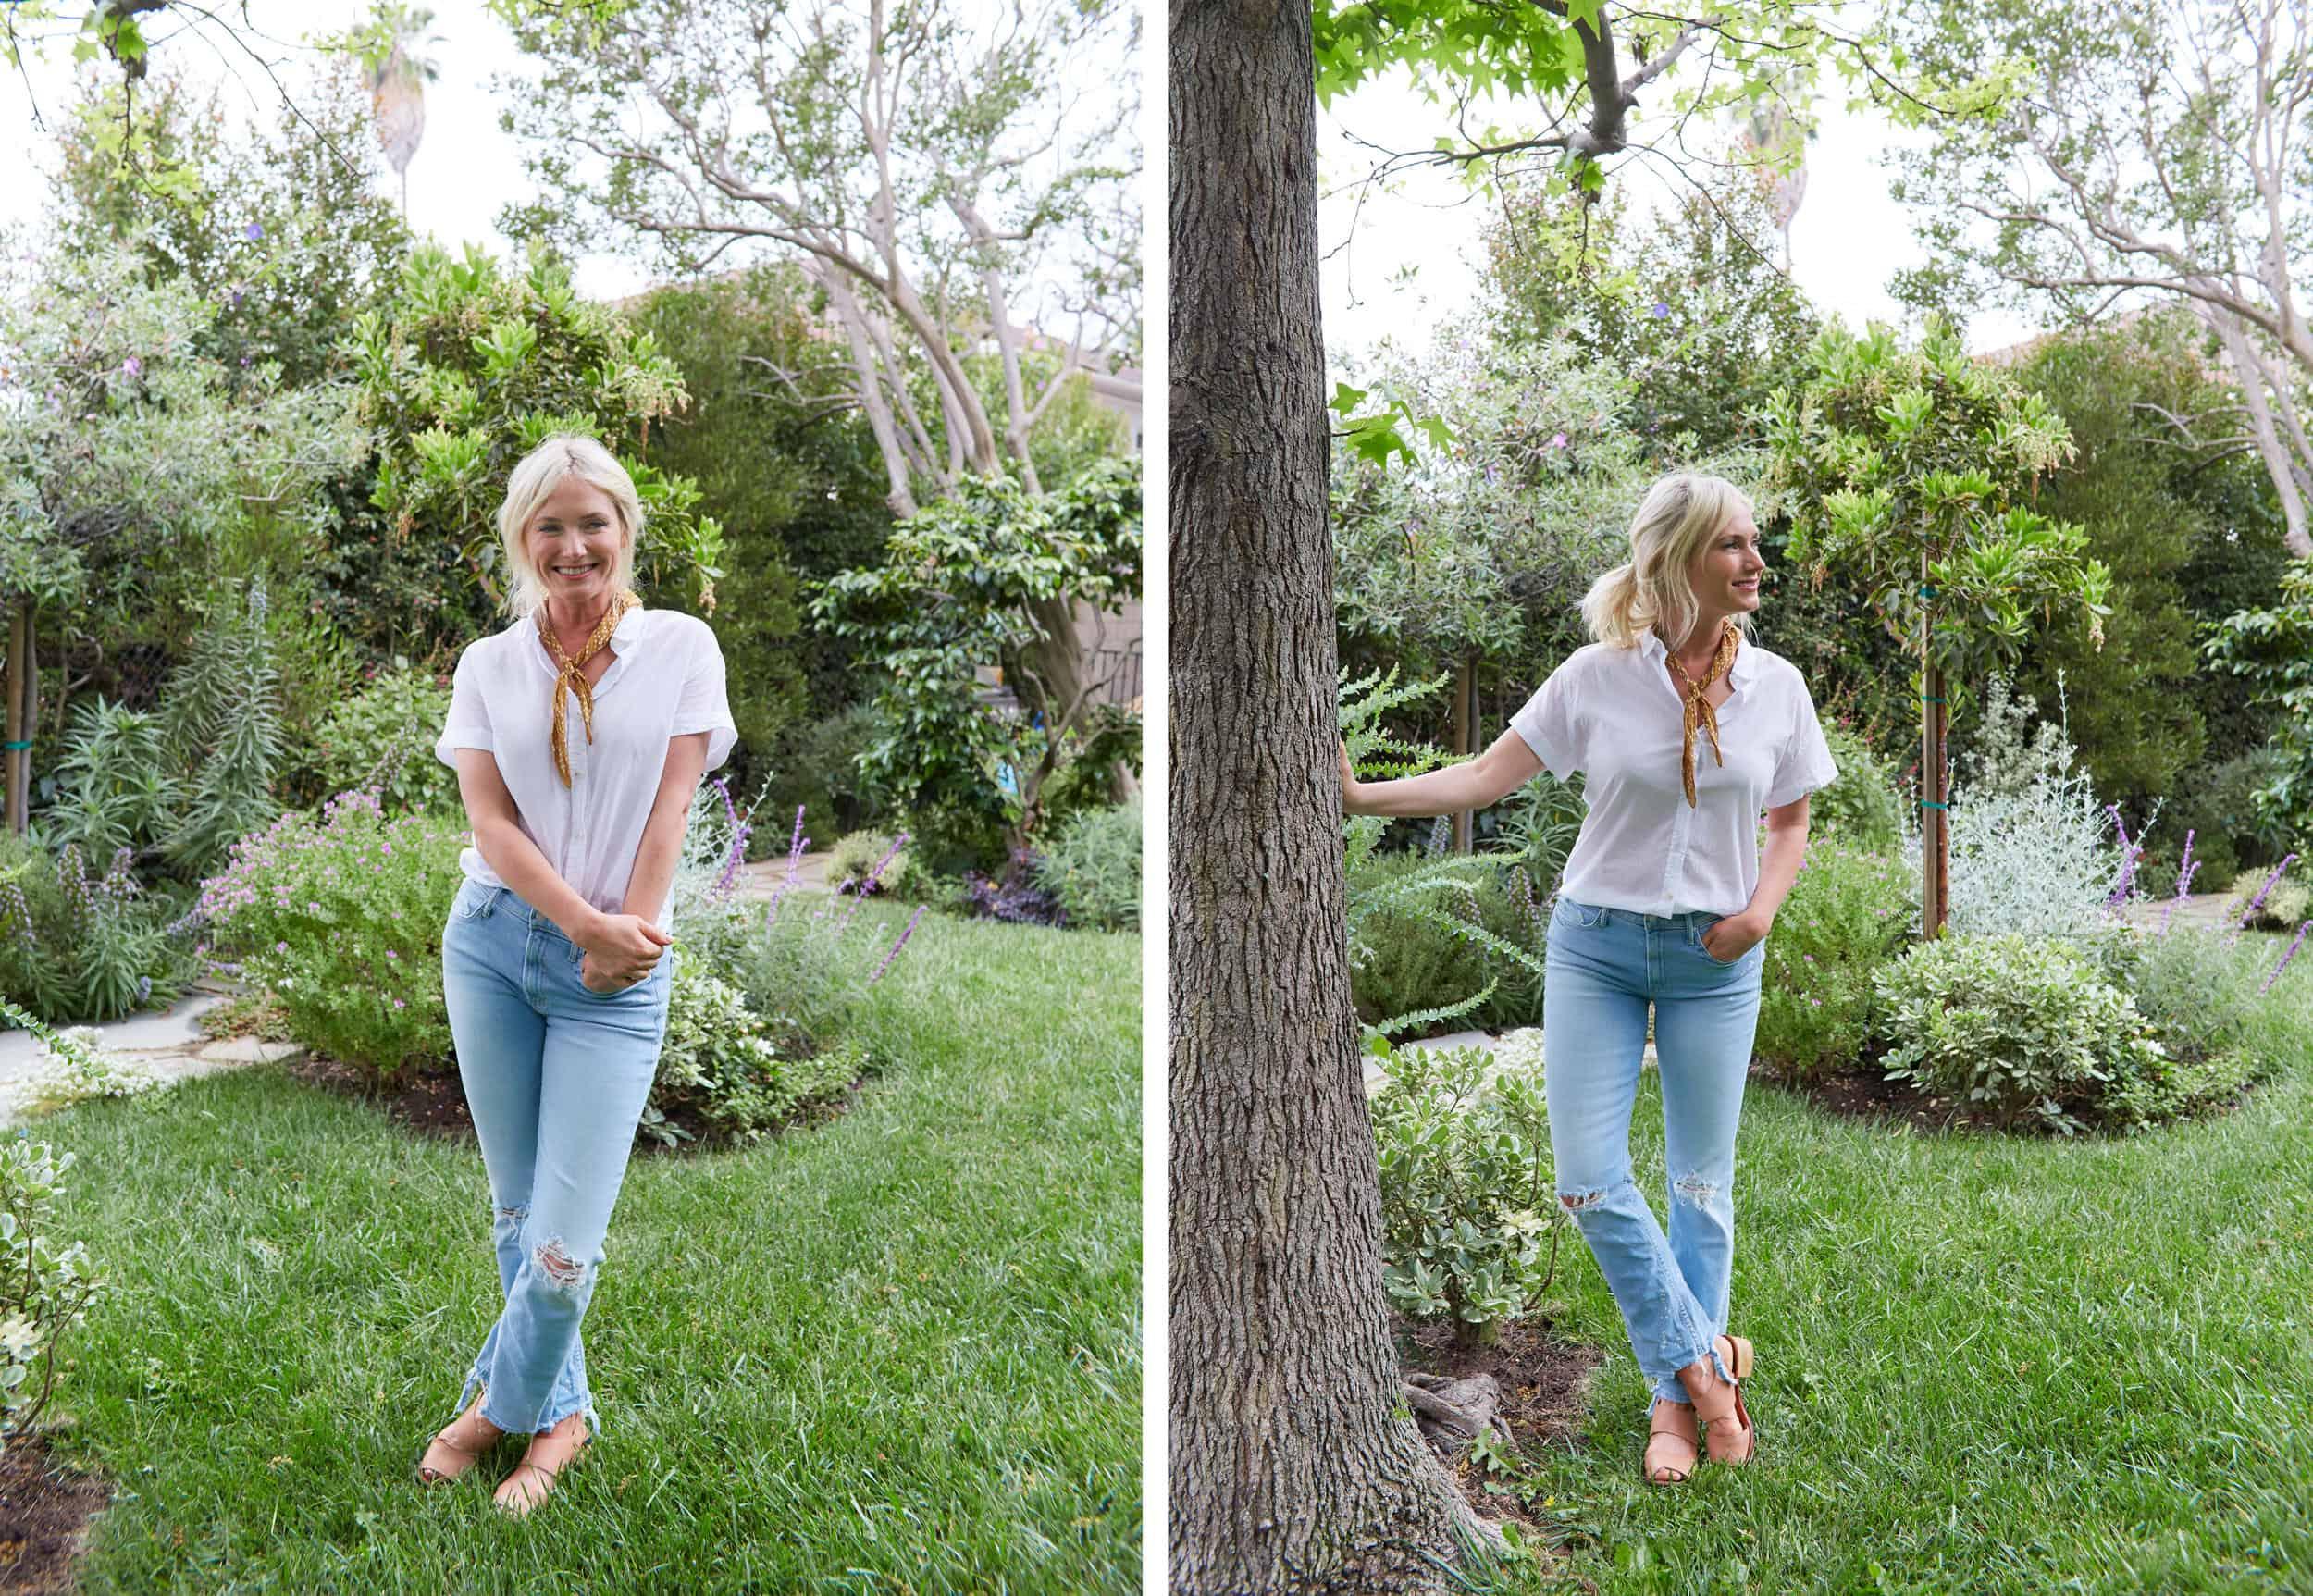 Emily Henderson Summer Fashion Basics Mother Denim Jeans